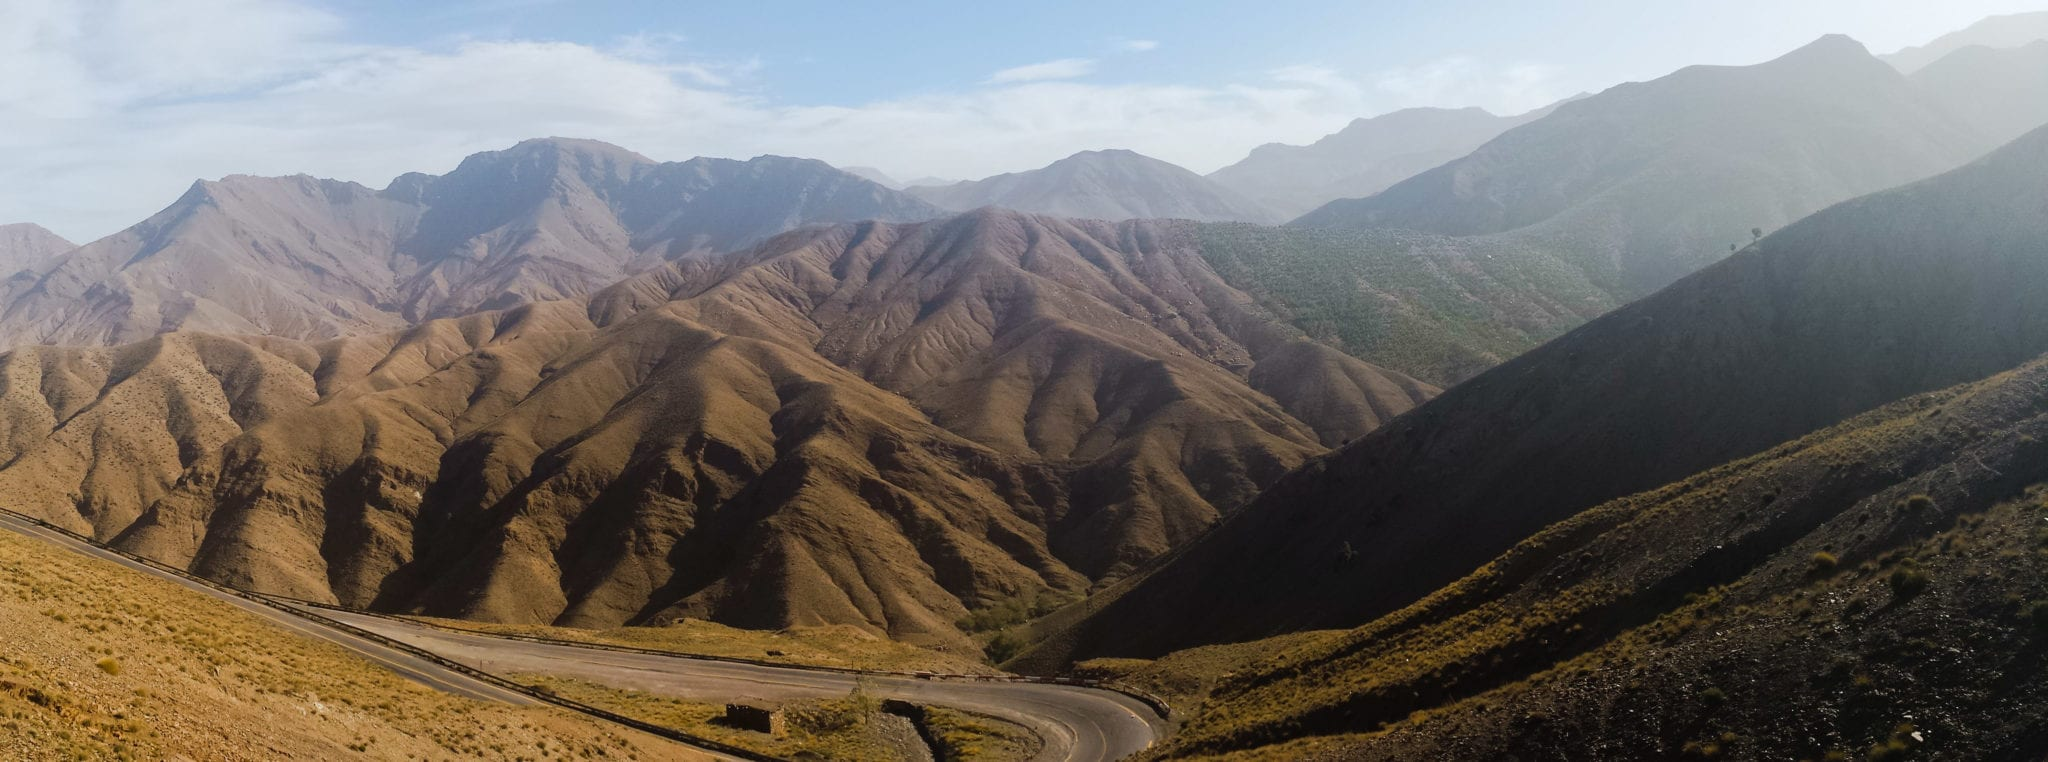 A day trip to the Atlas Mountains